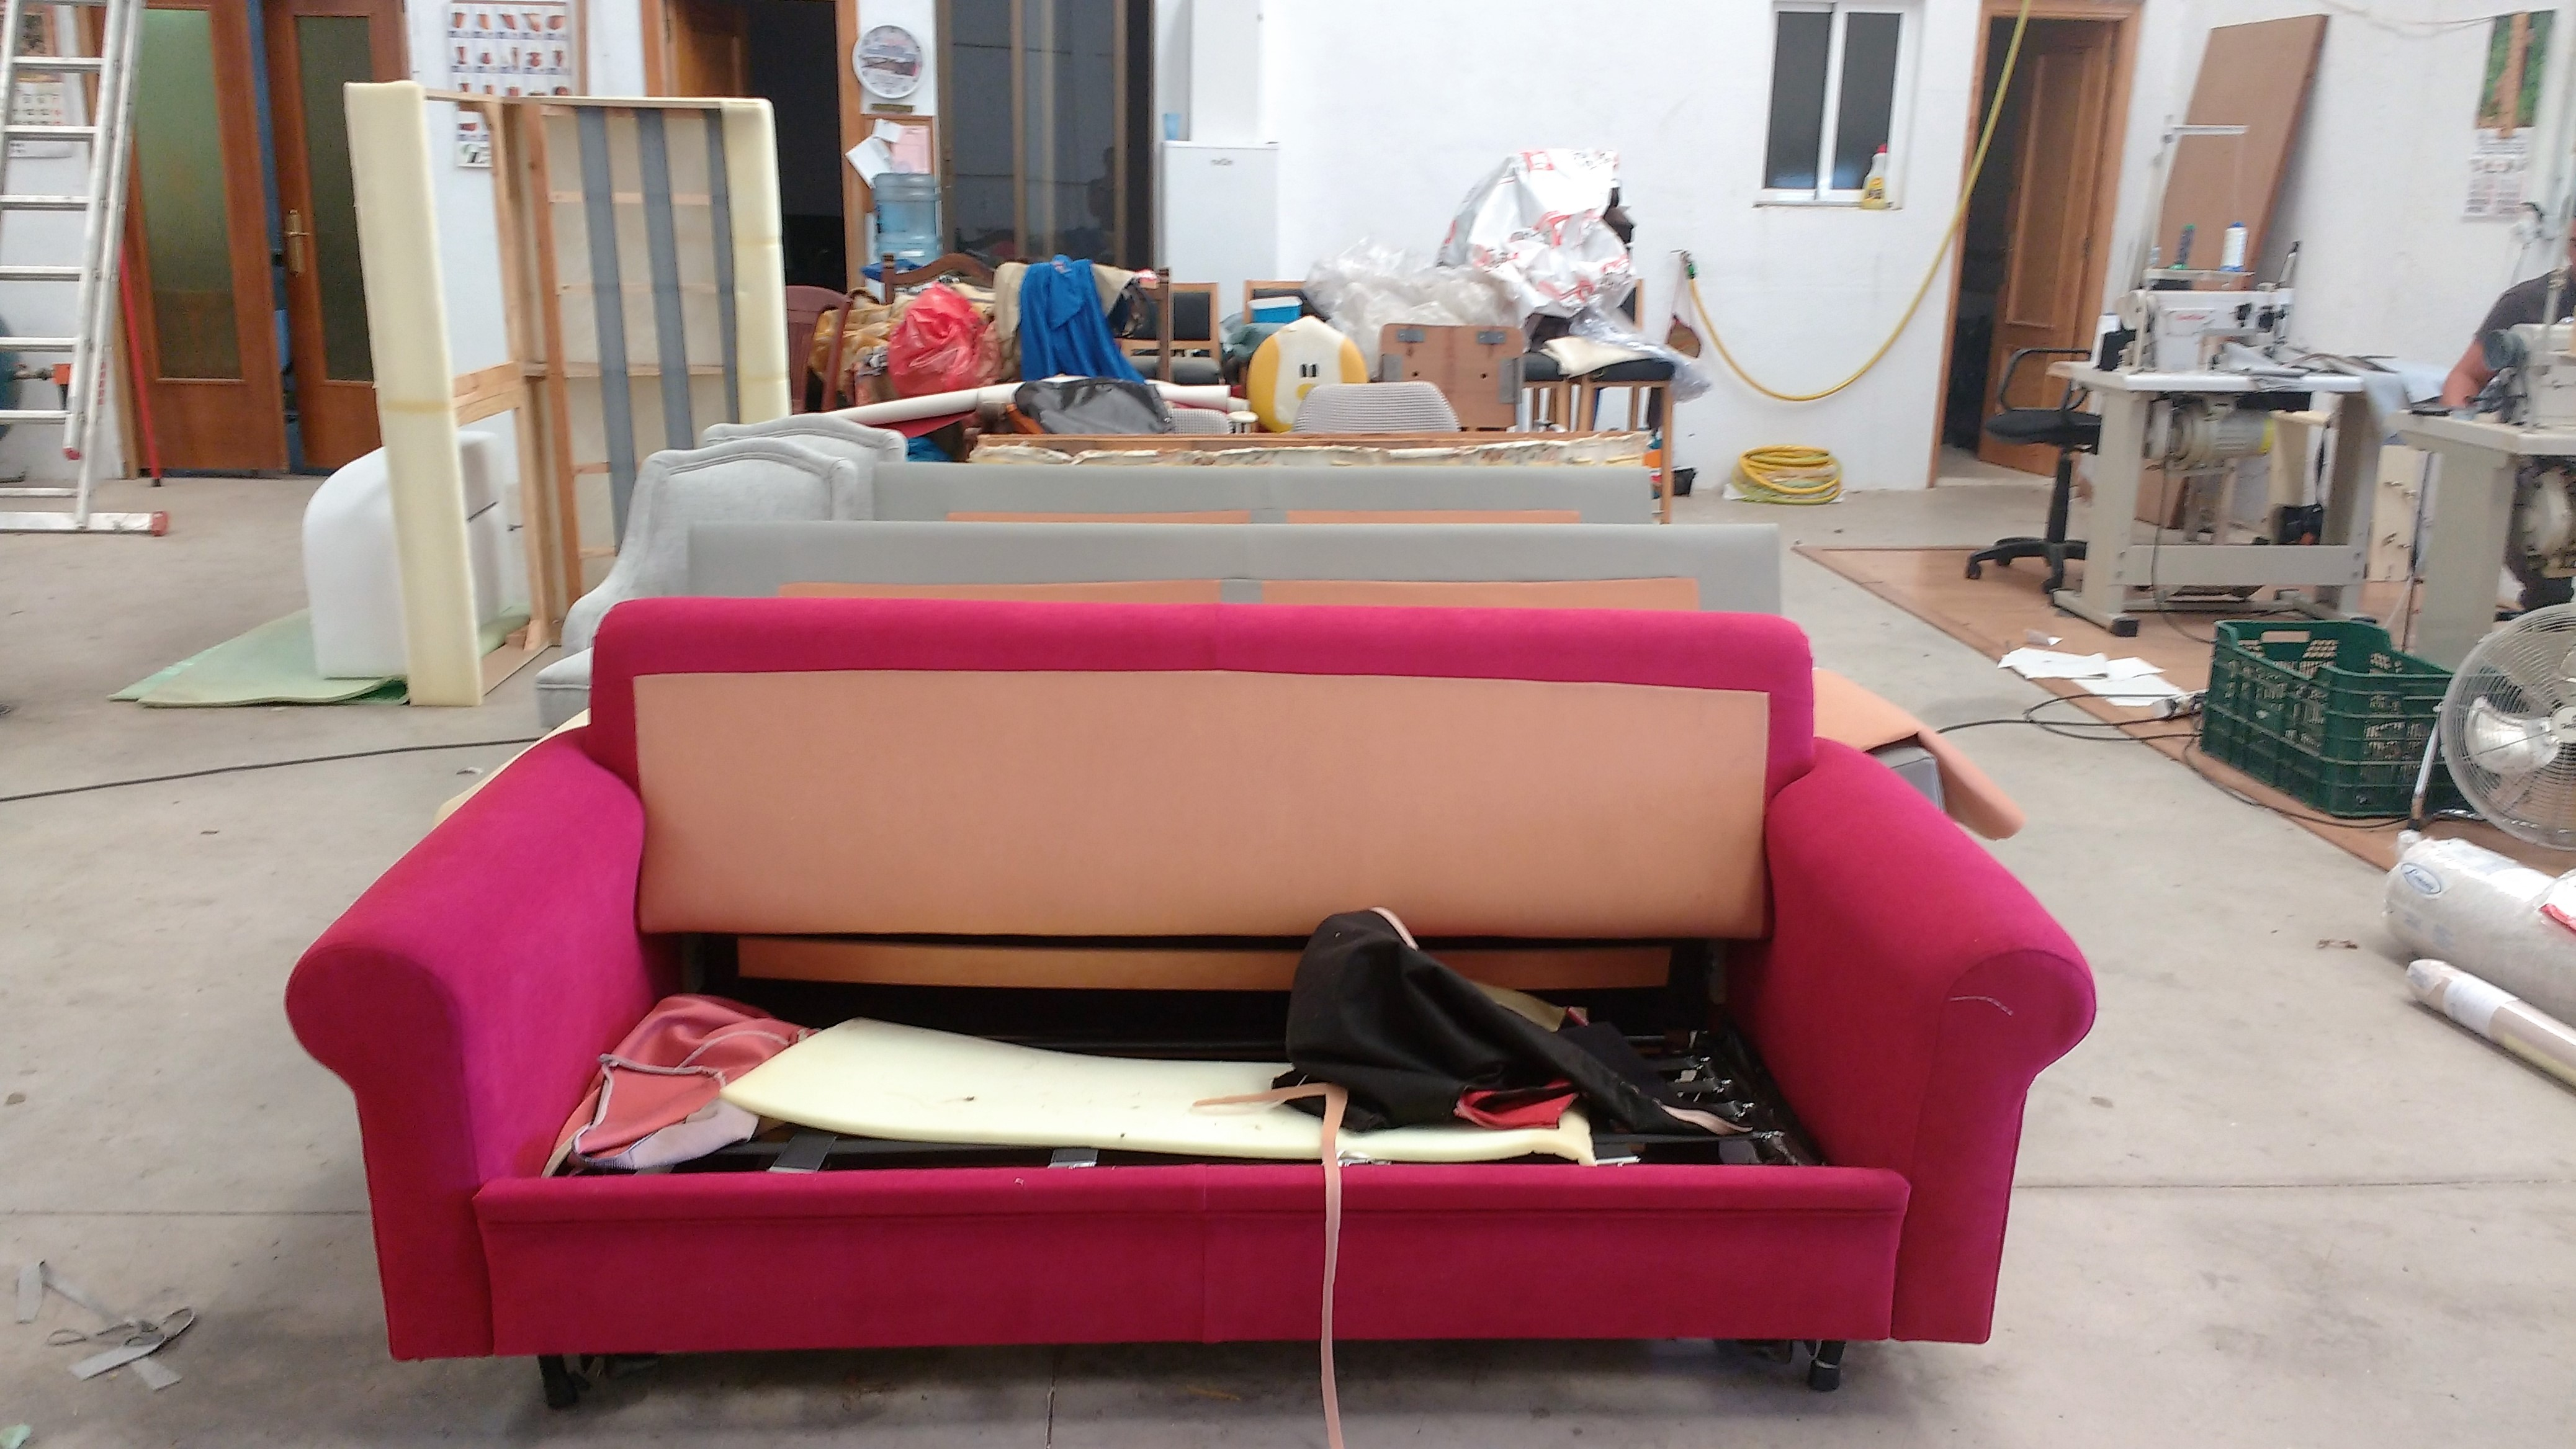 Muebles baratos en caceres mueble de saln with muebles for Muebles baratos alfafar